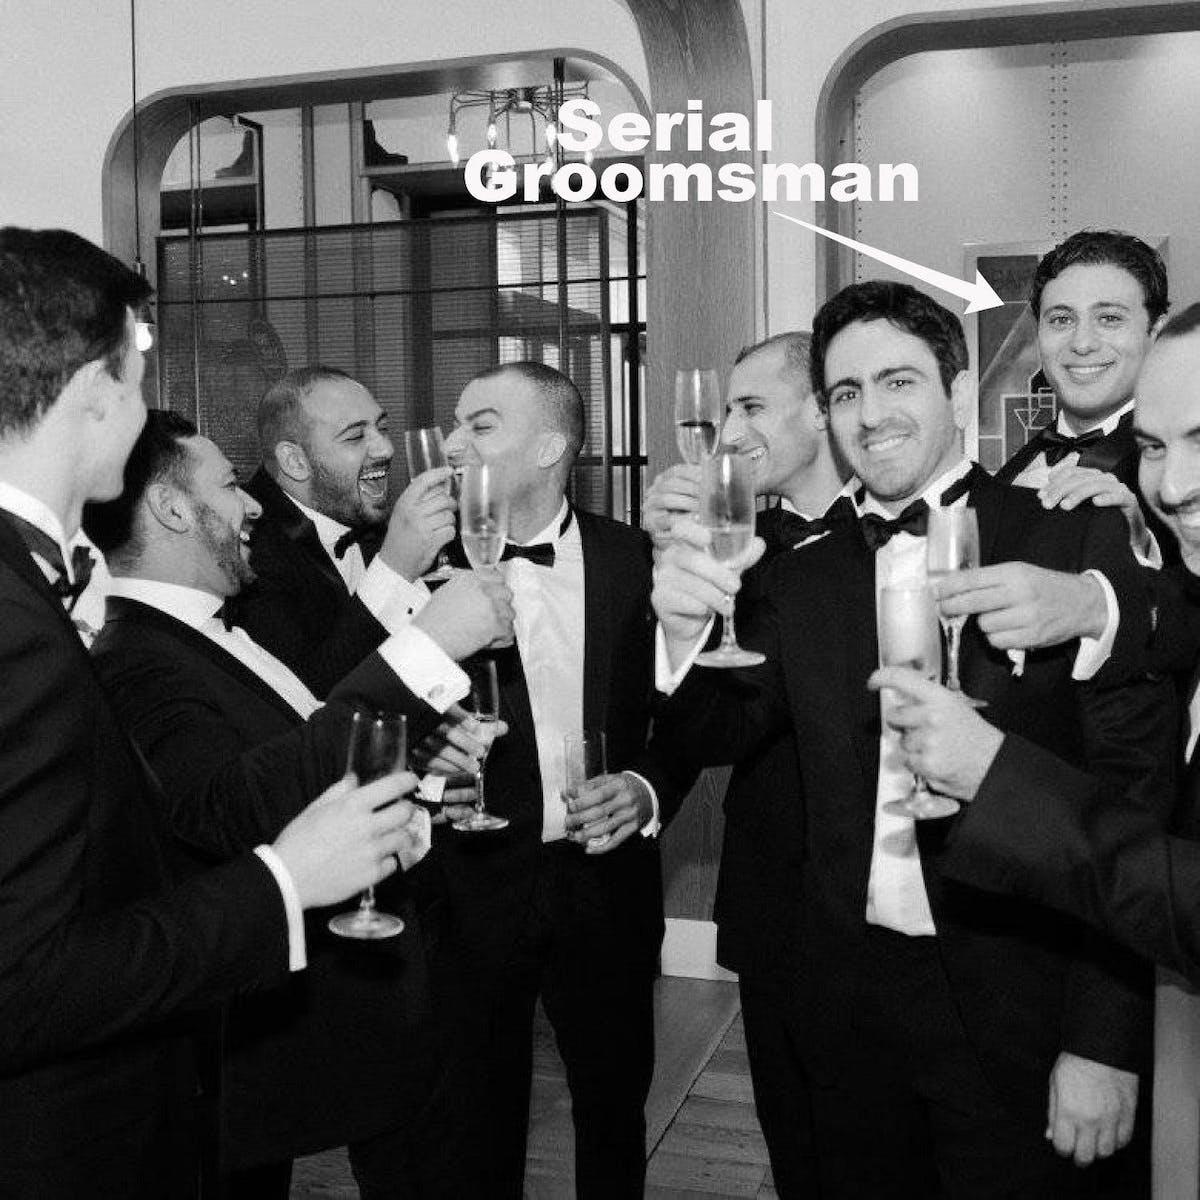 Groomsmen in Tuxedos